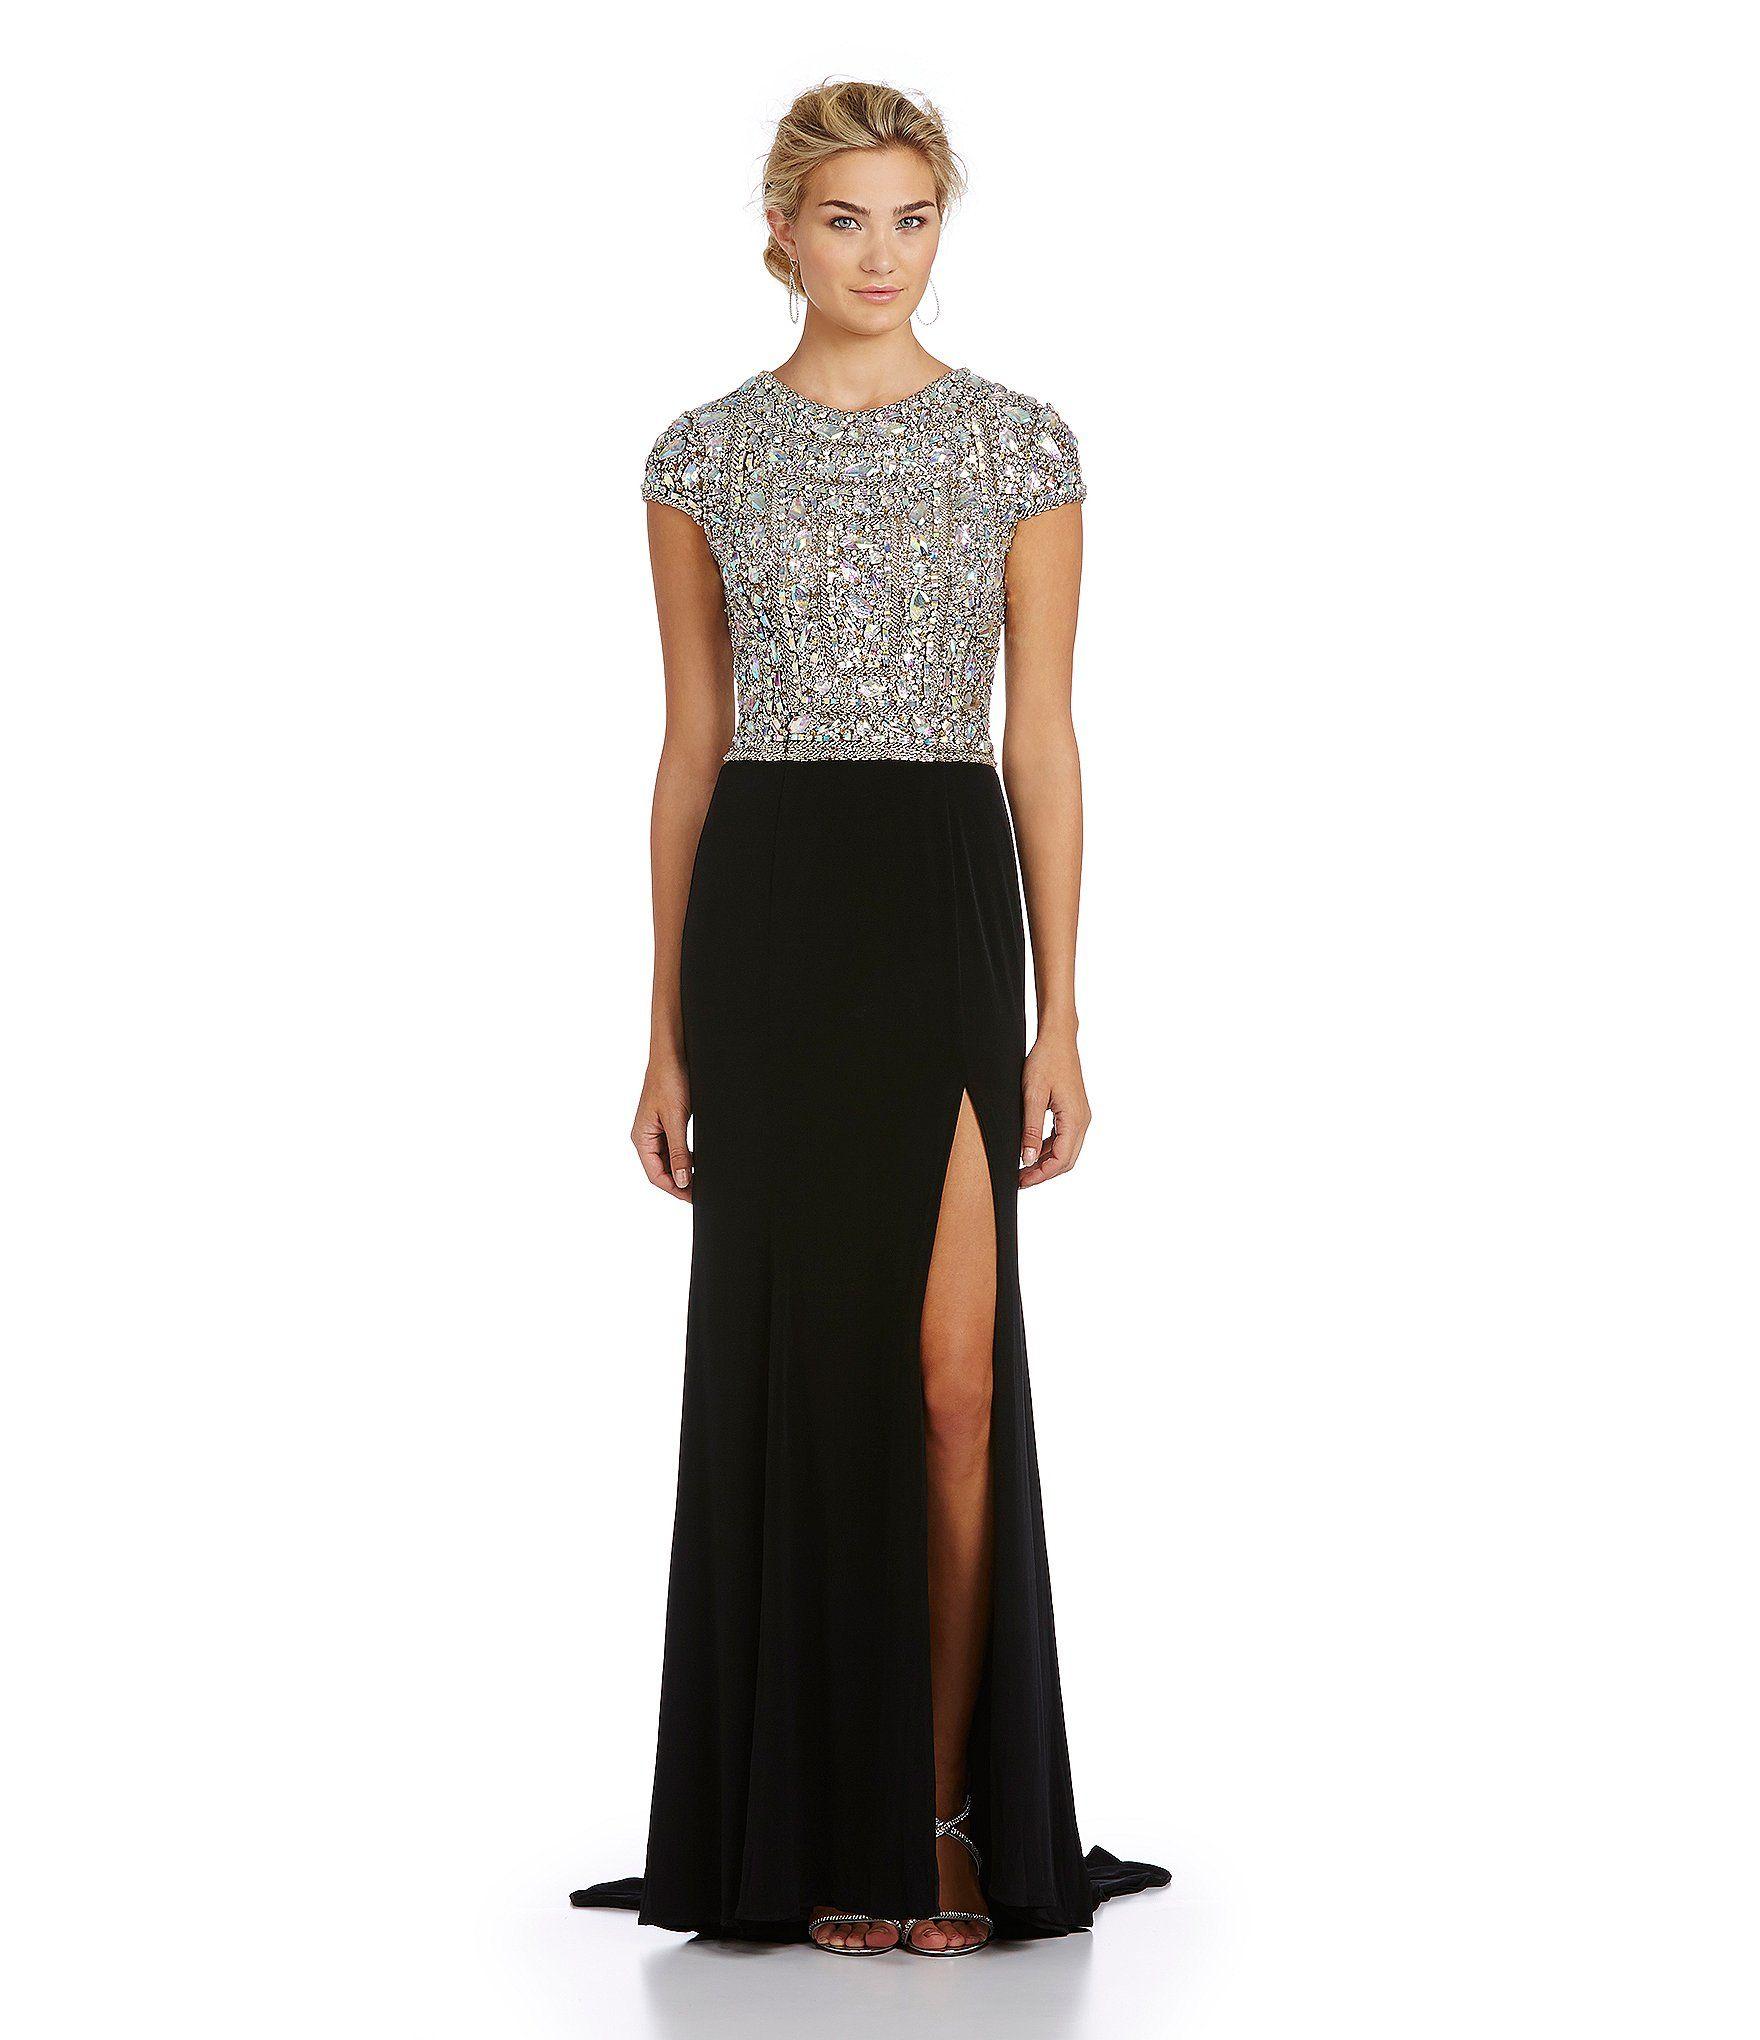 Terani couture beadedbodice gown dillards wedding pinterest